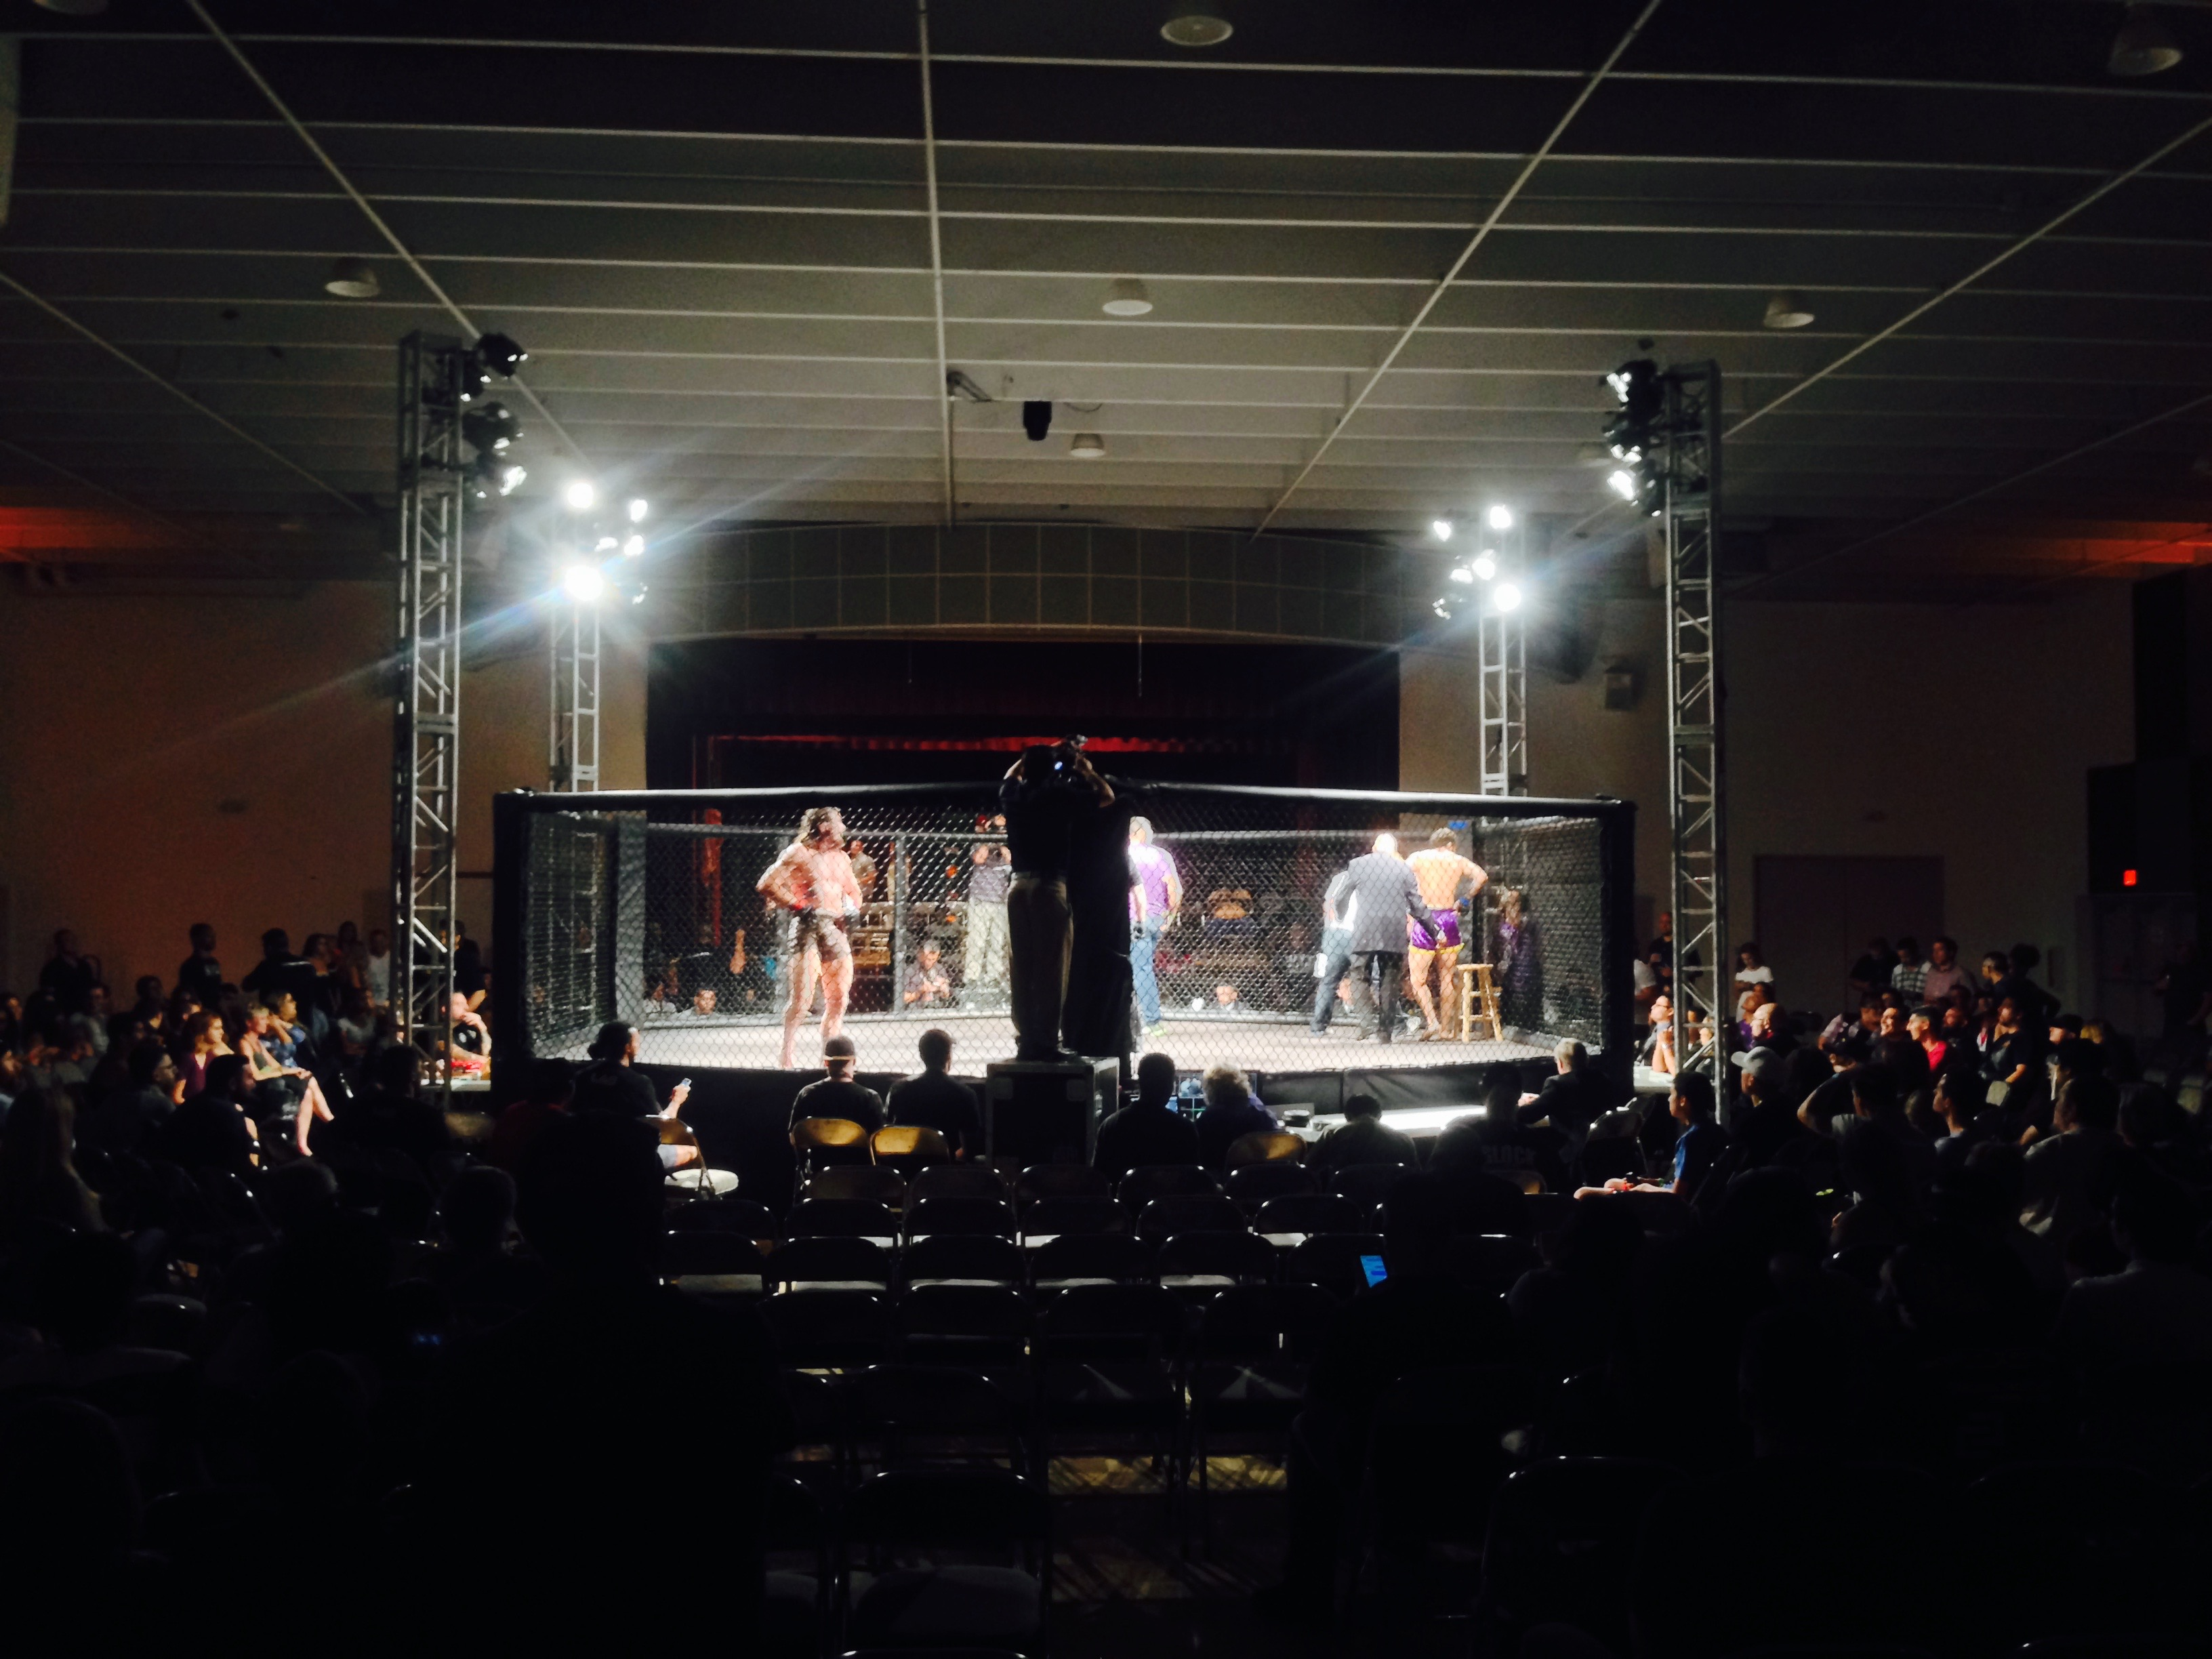 MMA event Phx AZ